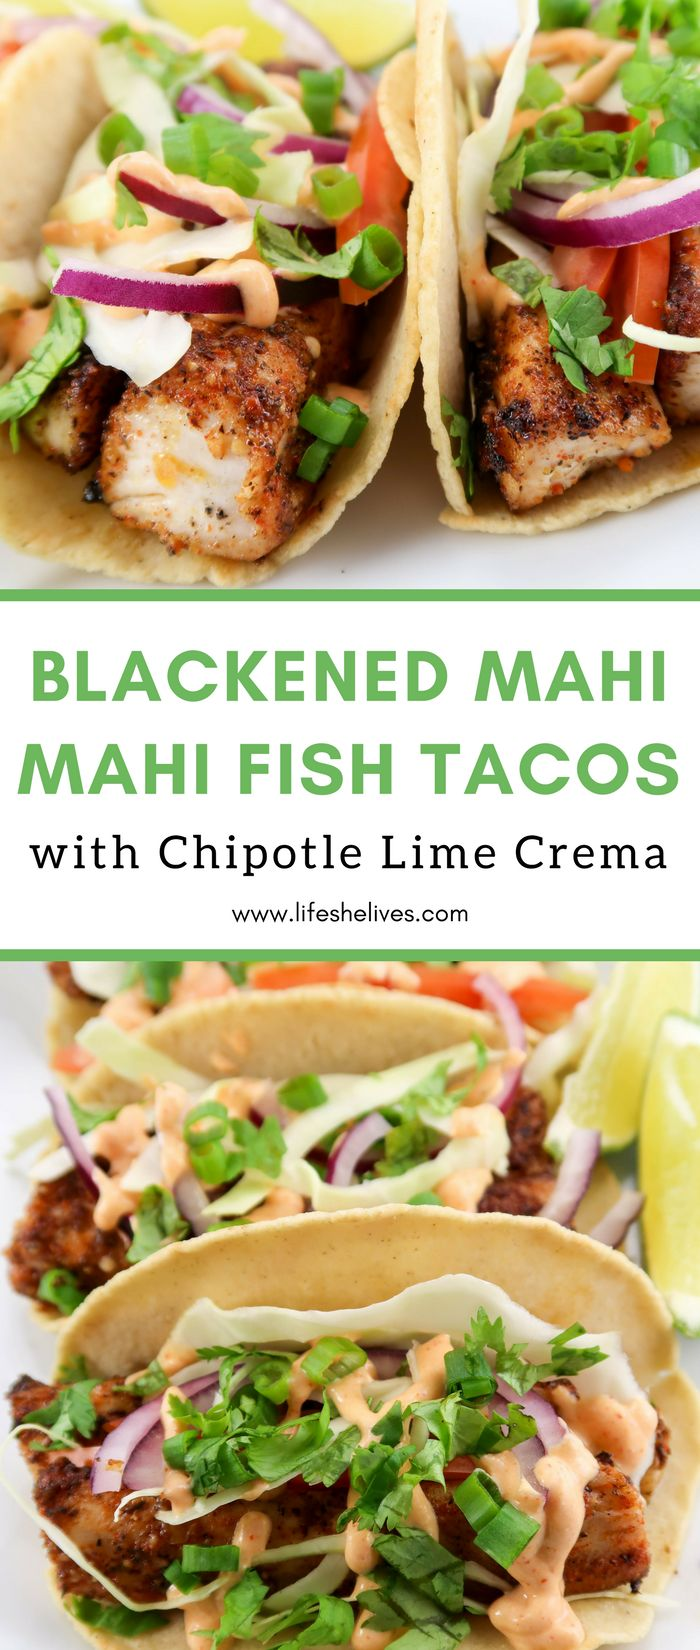 Blackened Mahi Mahi Fish Tacos with Chipotle Lime Crema